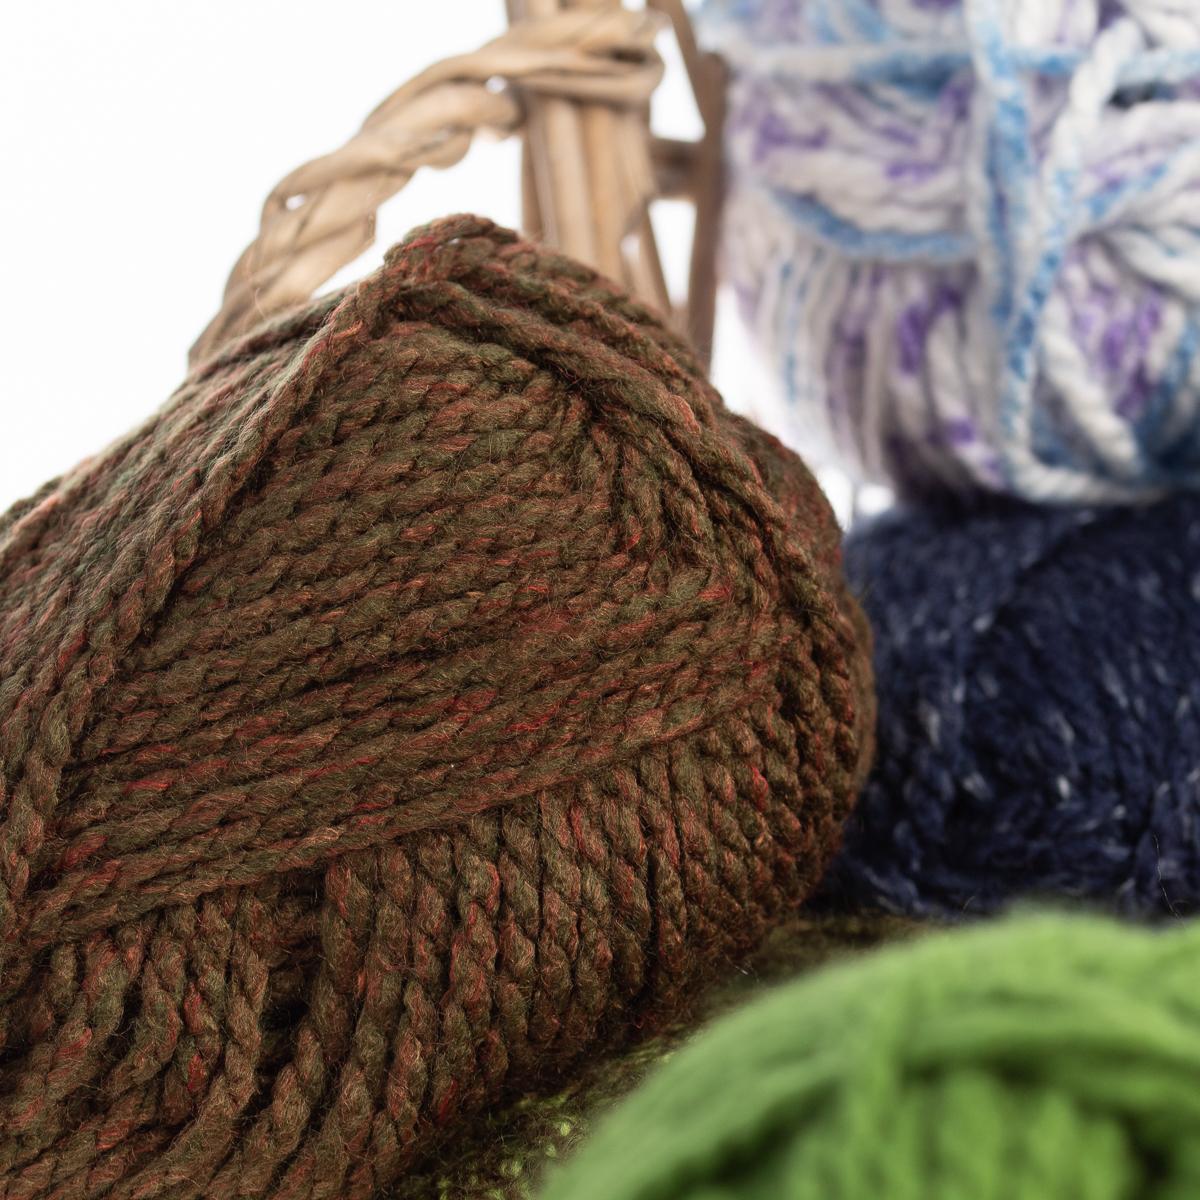 3pk-Premier-Yarns-Deborah-Norville-Serenity-100-Acrylic-Yarn-Chunky-5-Knitting thumbnail 94